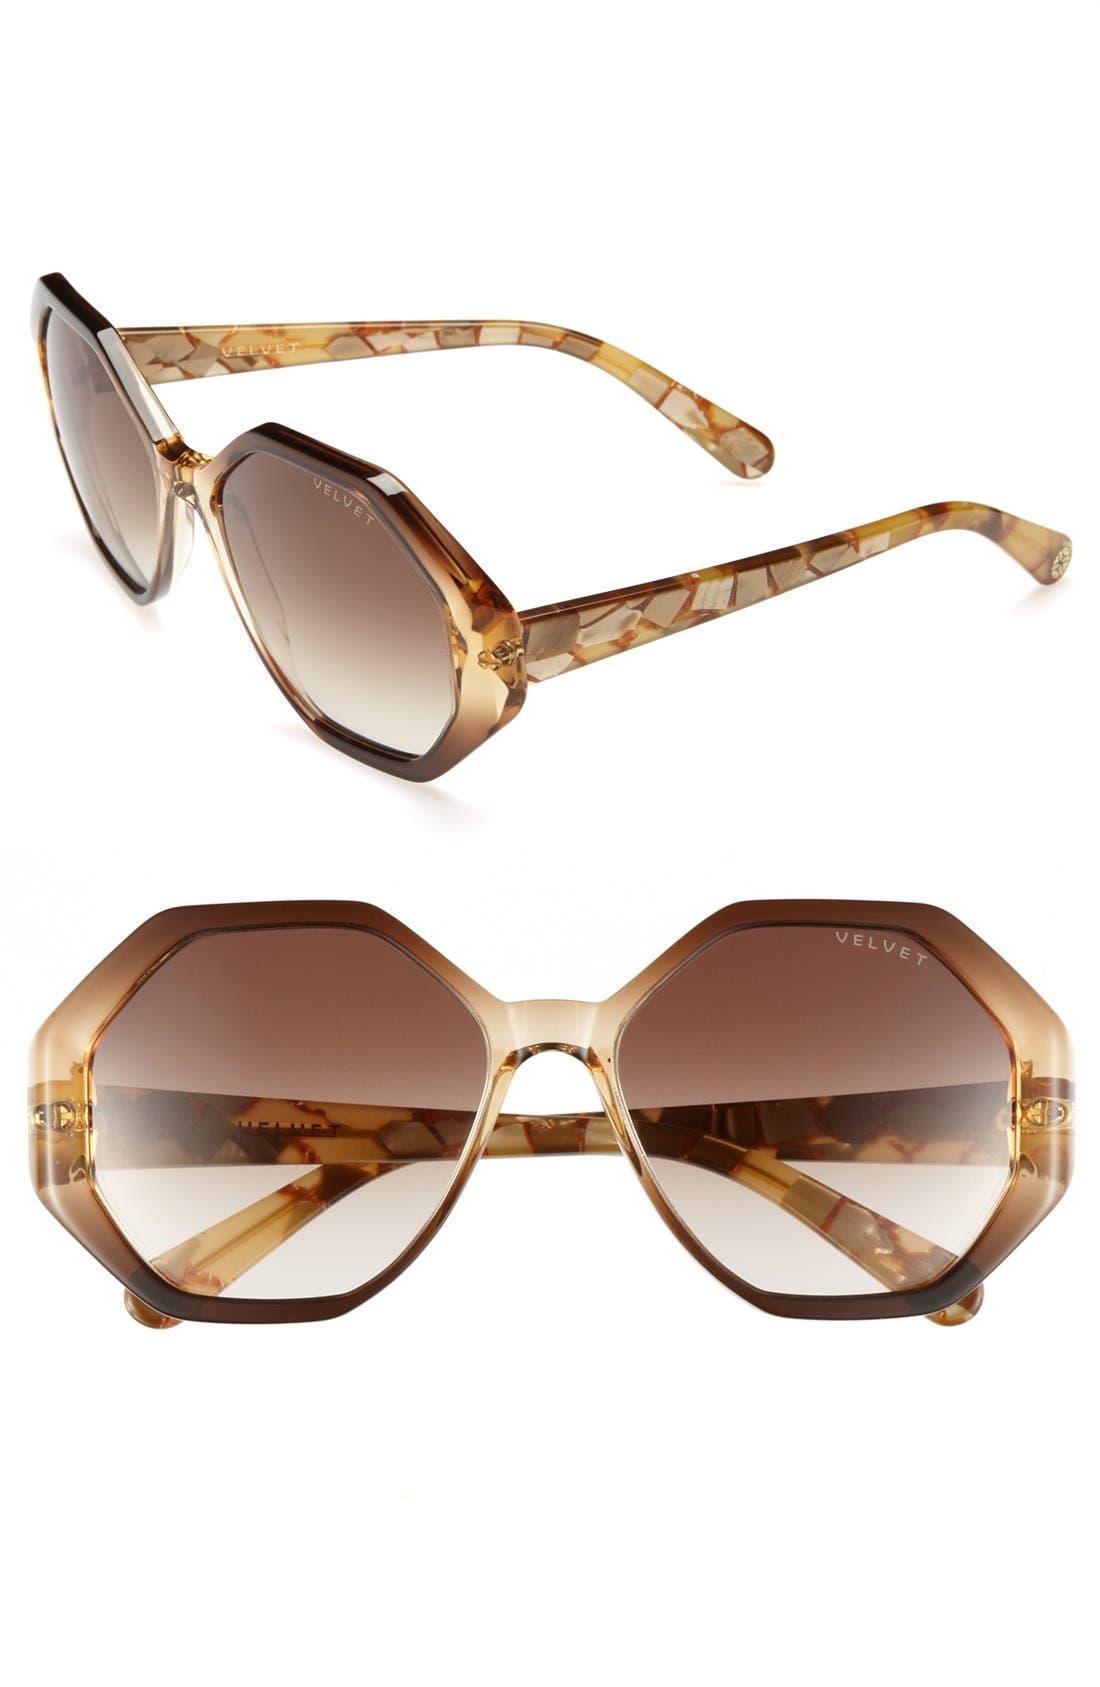 Main Image - Velvet Eyewear 'Jami' Sunglasses